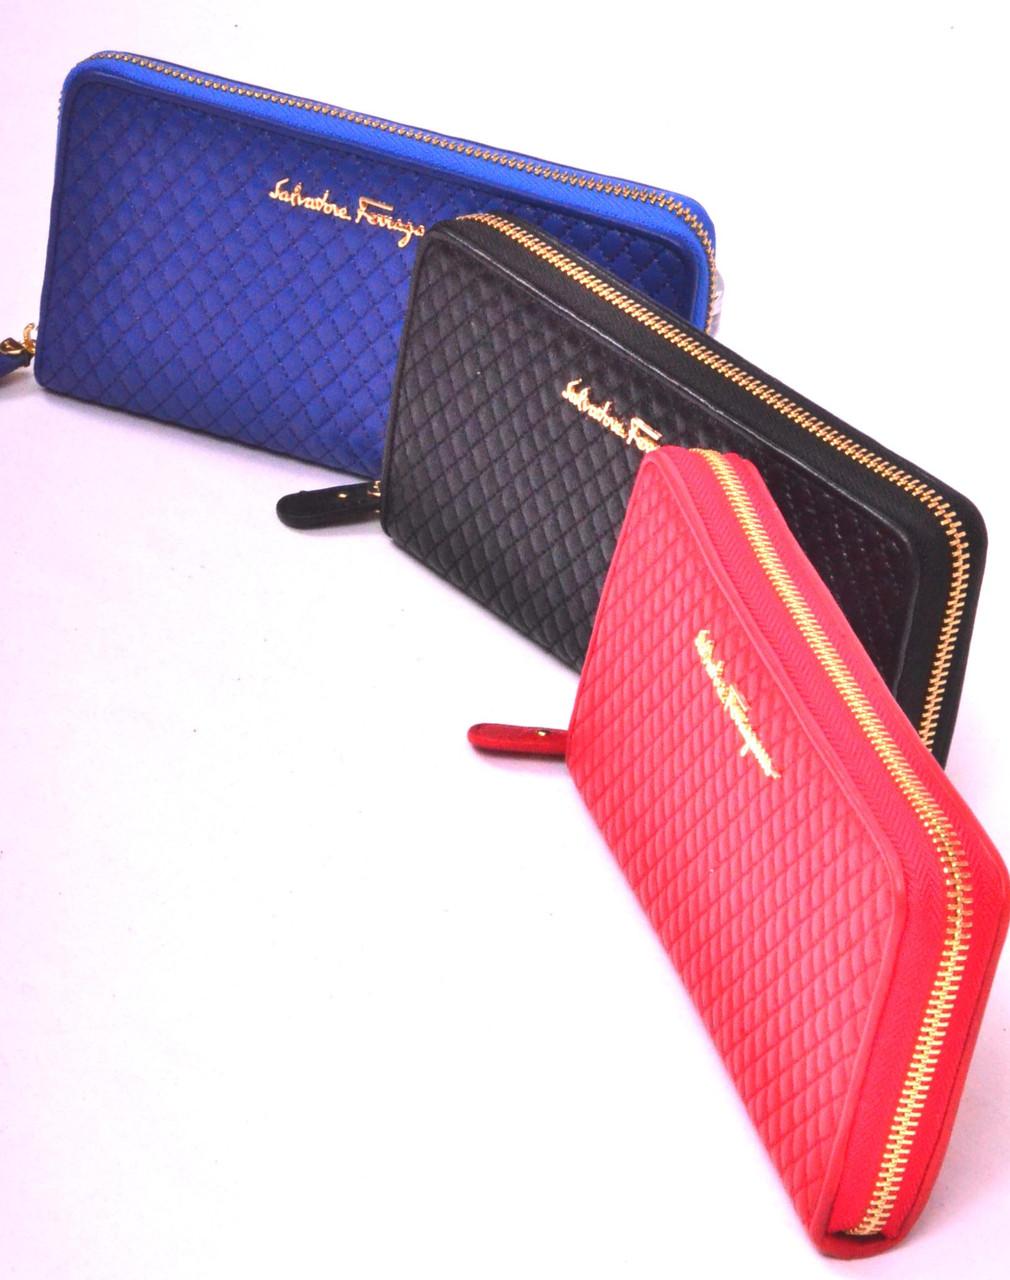 4c4b3fdf6fab Кошелек женский Ferragamo 8030 женский кошелек купить: продажа, цена ...